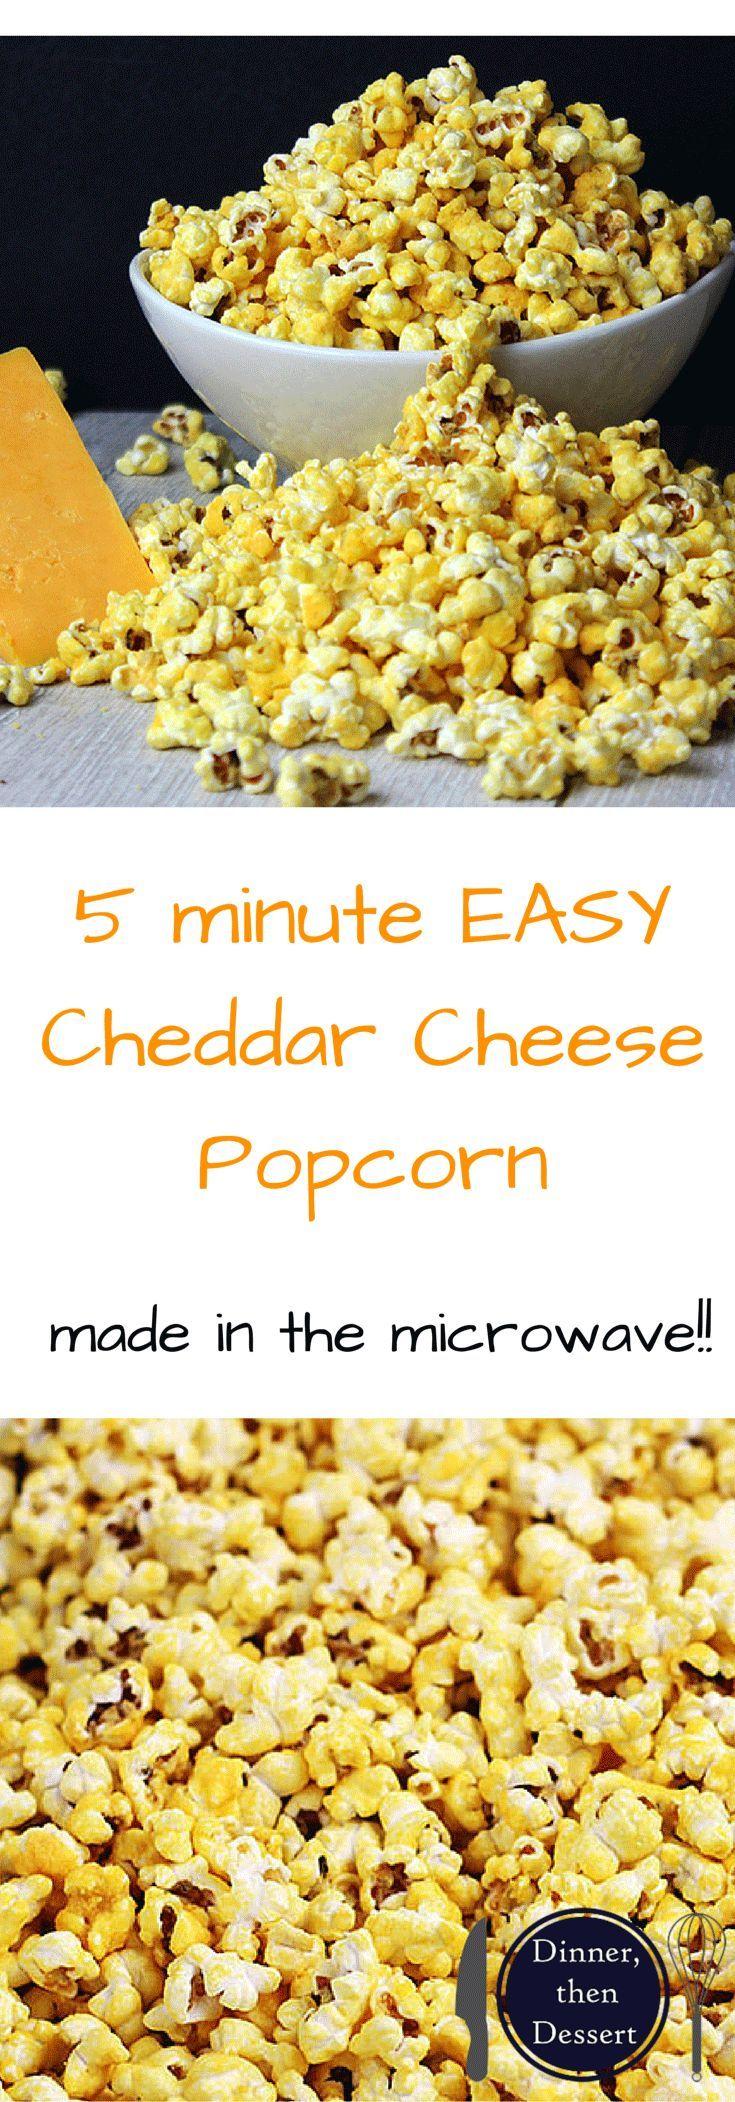 best popcorn bar images on pinterest gourmet popcorn popcorn